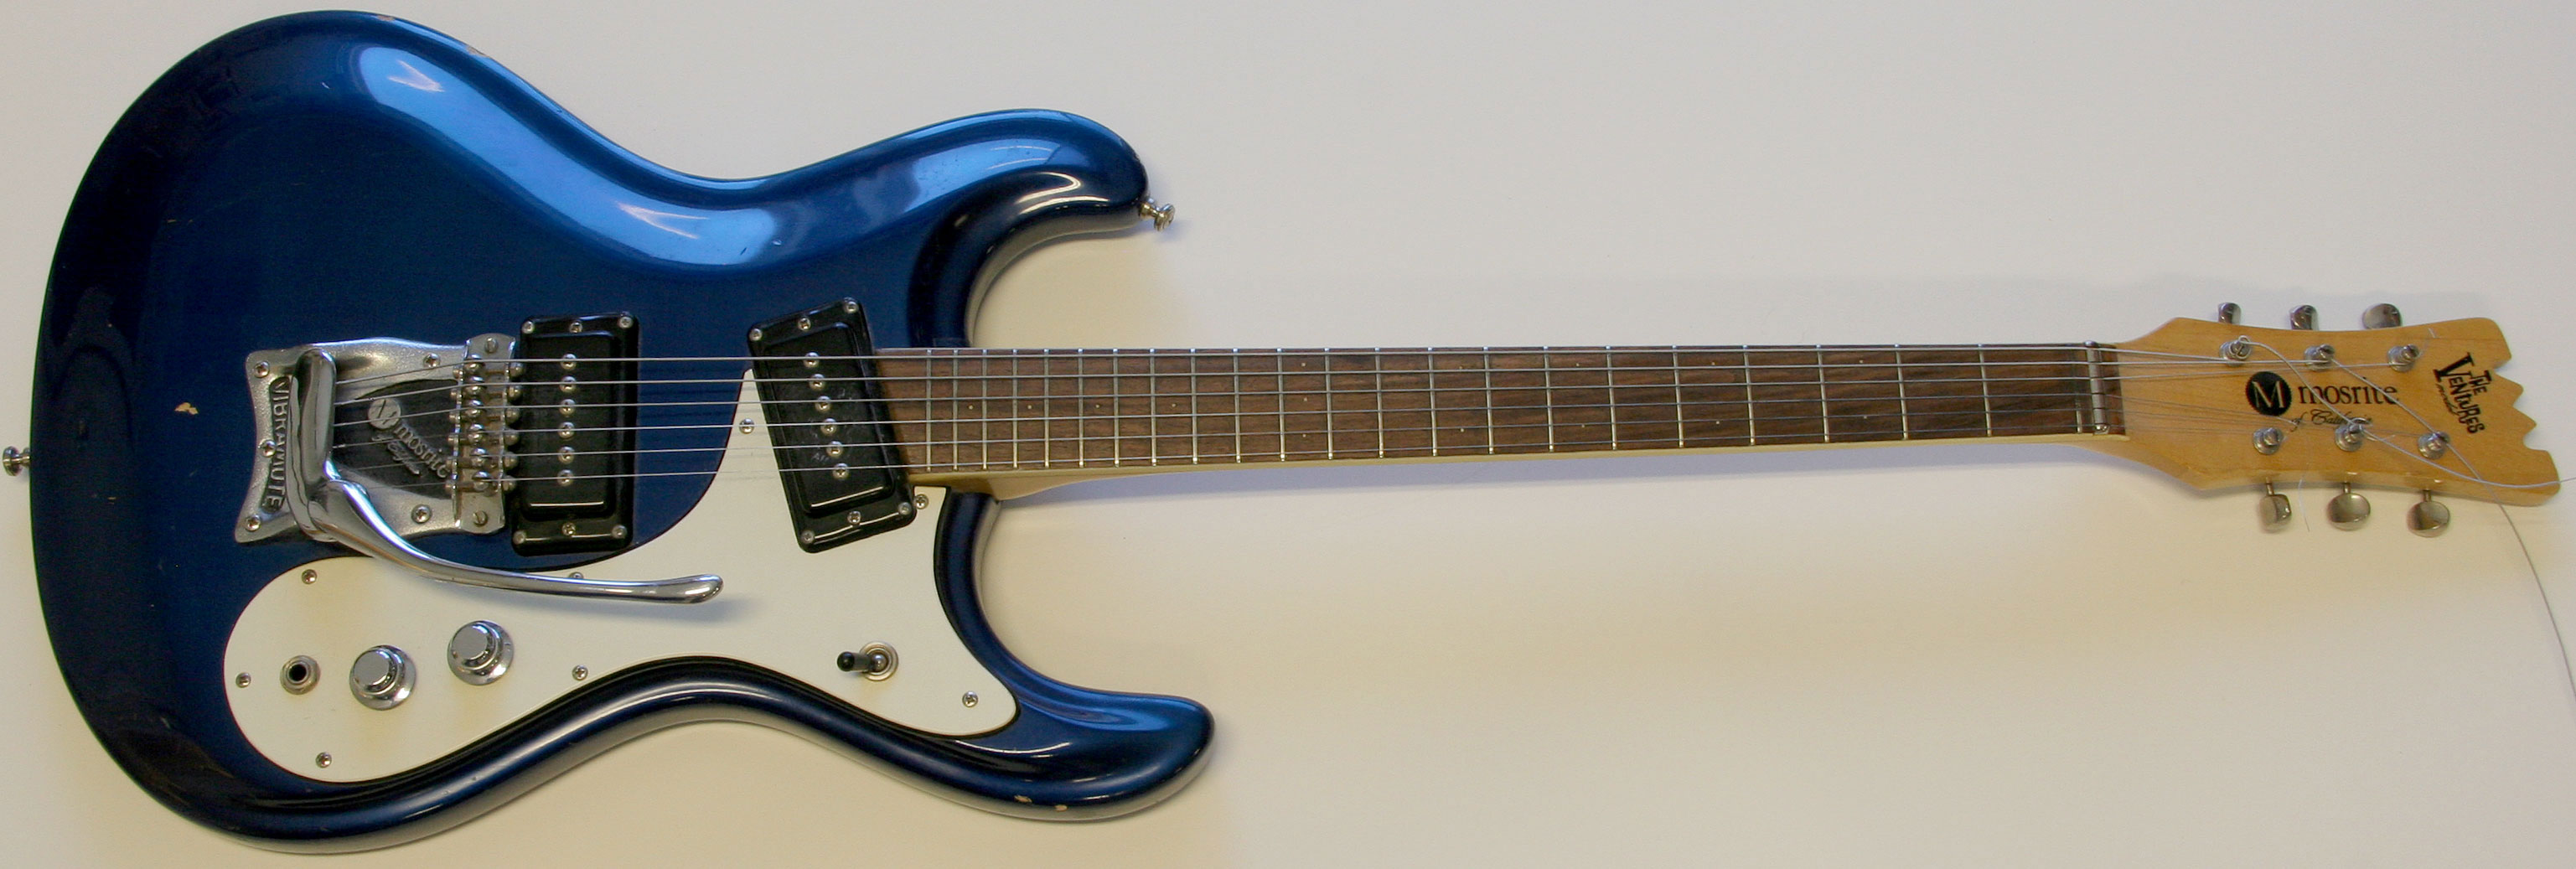 Artist guitars artistic guitars the ventures mosrite guitar buycottarizona